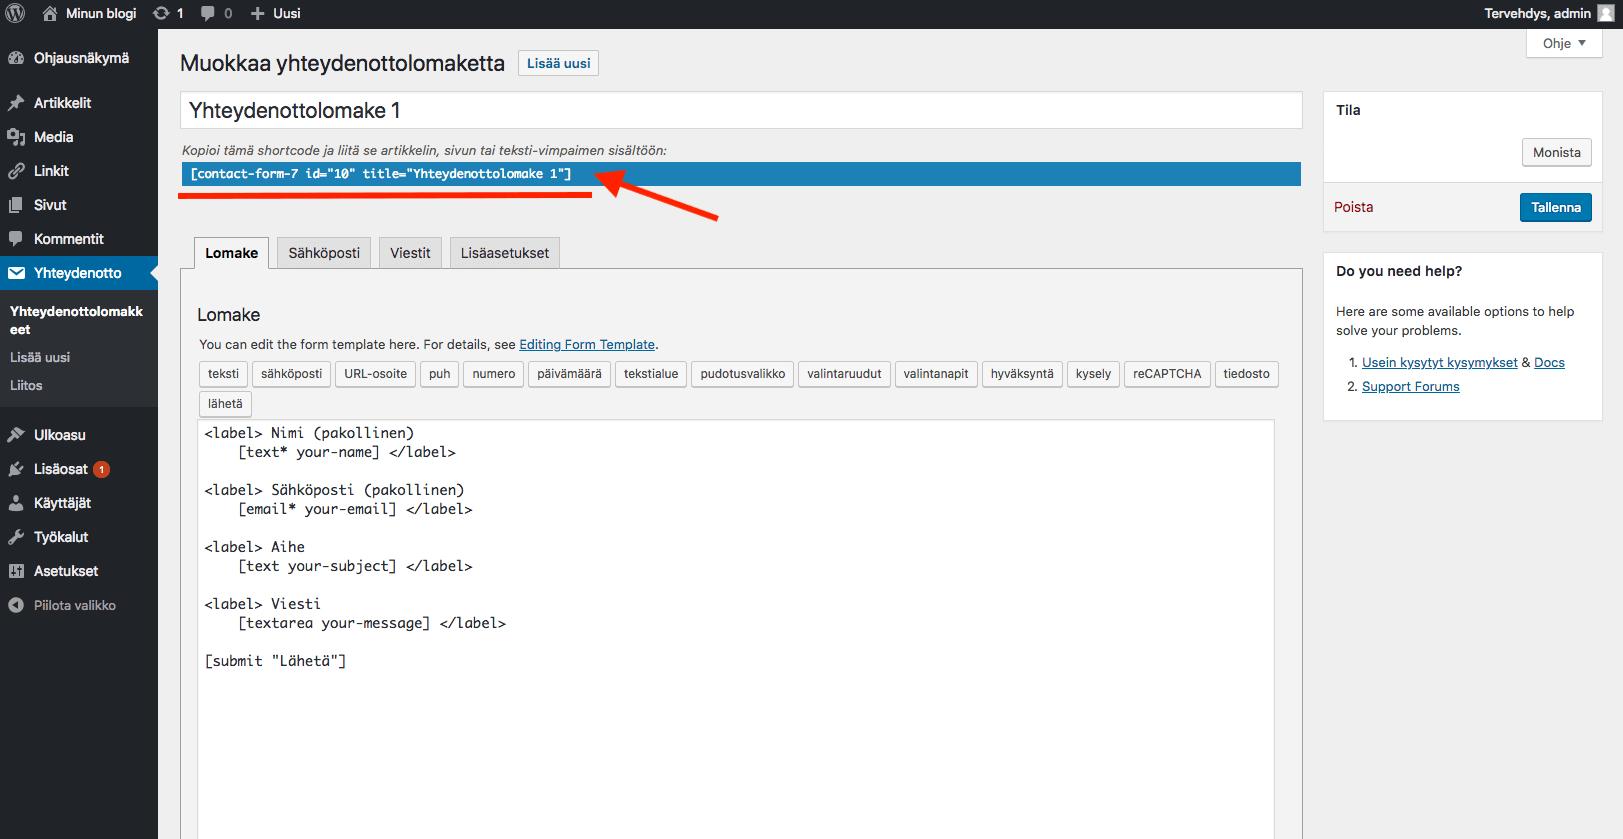 WordPress ohjeet - reCAPTCHA asennus